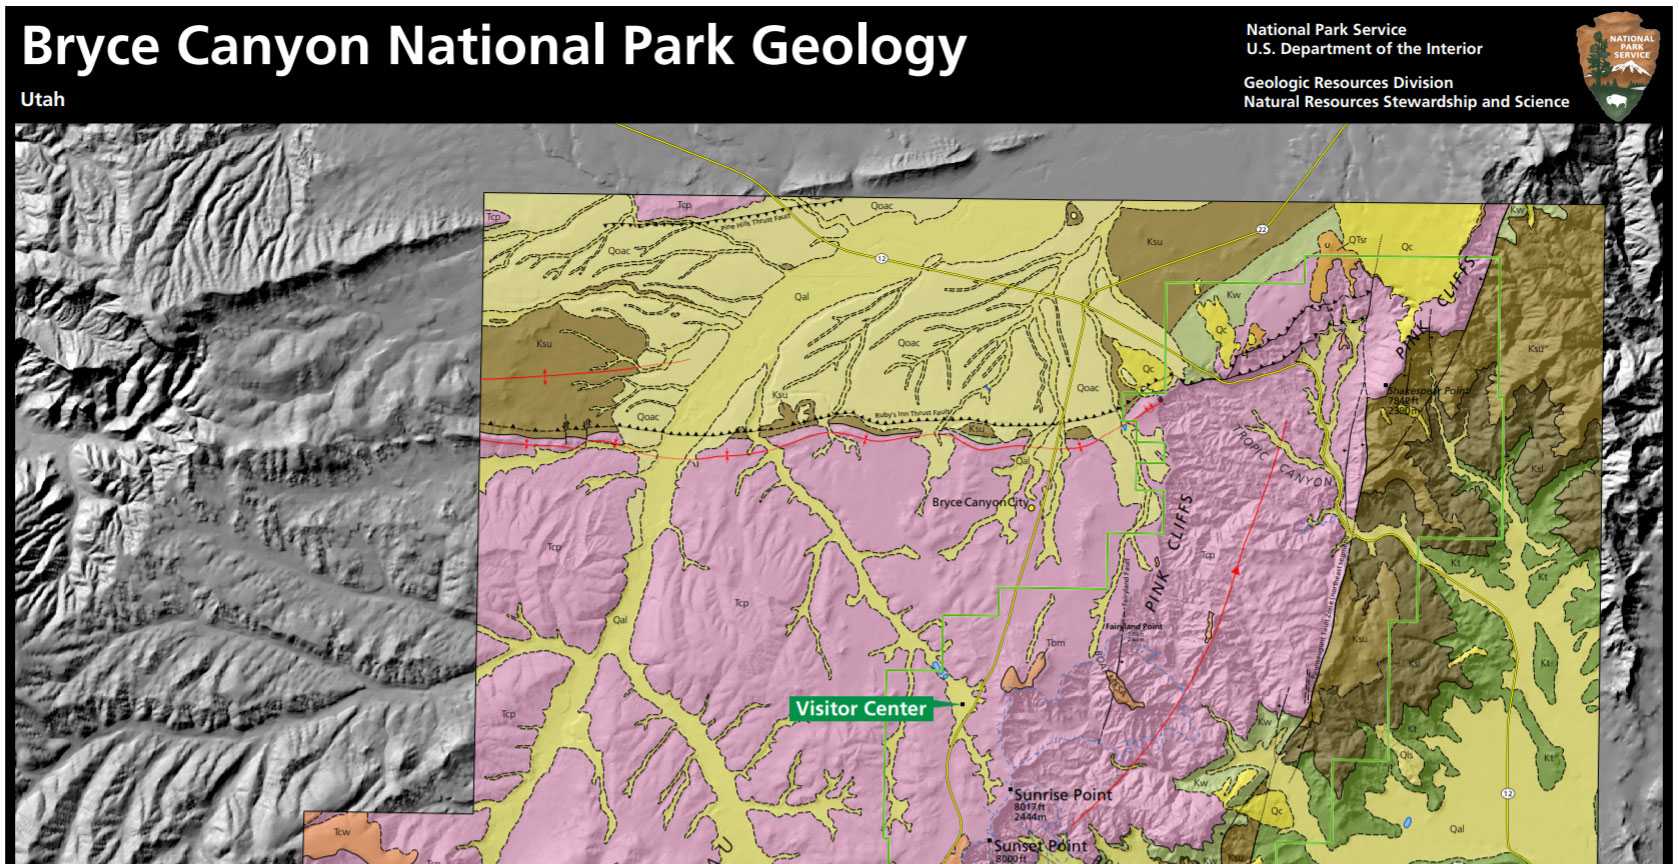 Nps Geodiversity Atlas Bryce Canyon National Park Utah U S